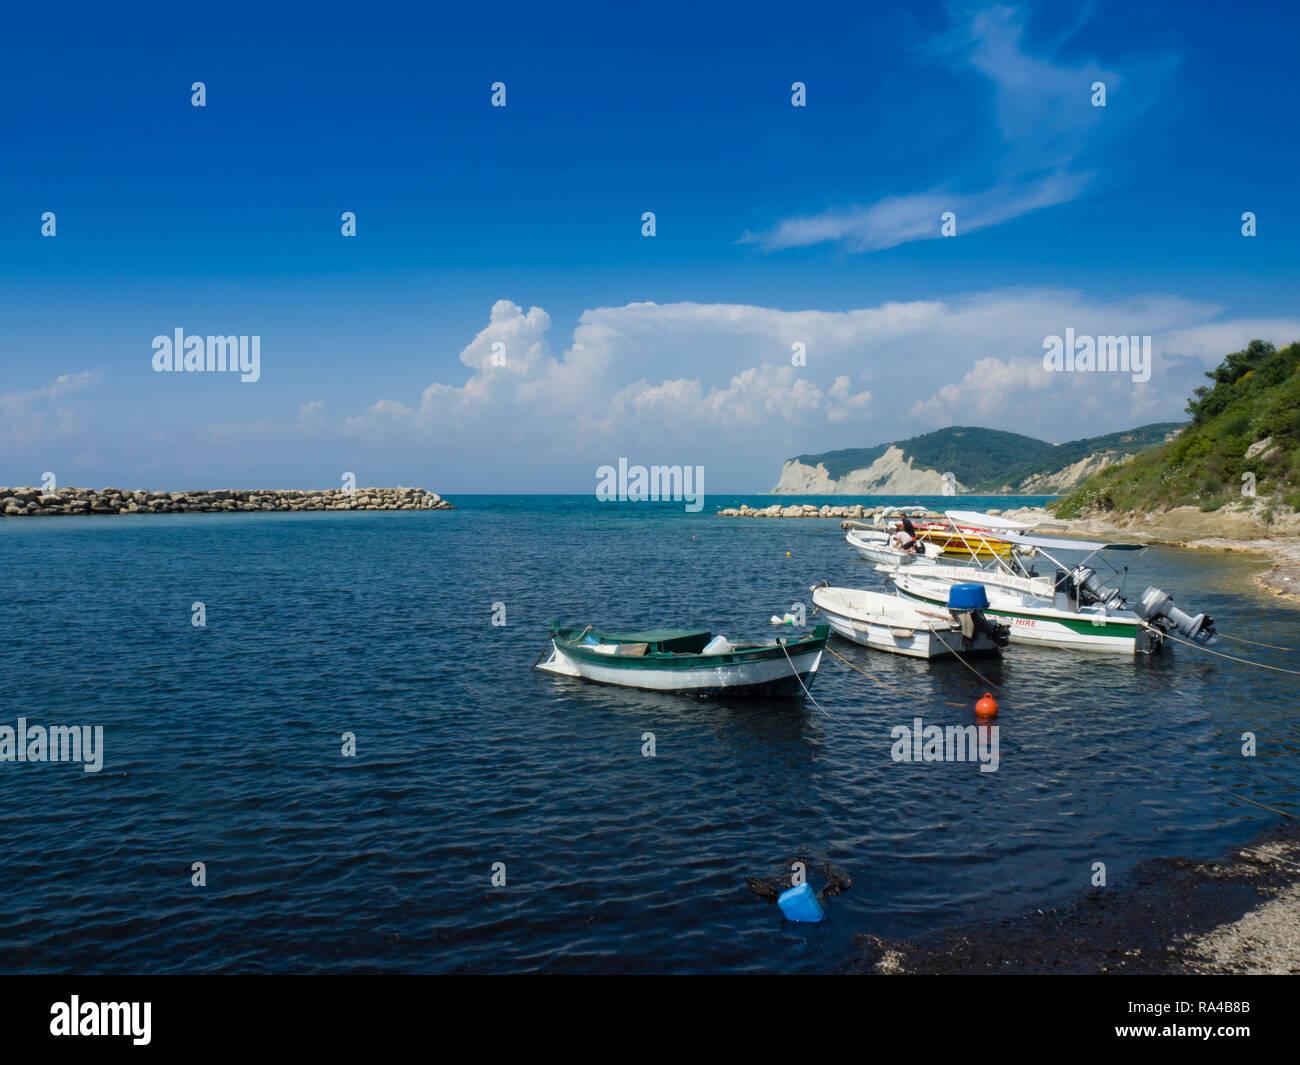 Pleasure boats moored off Kassiopi beach on the Greek island of Corfu Greece. - Stock Image